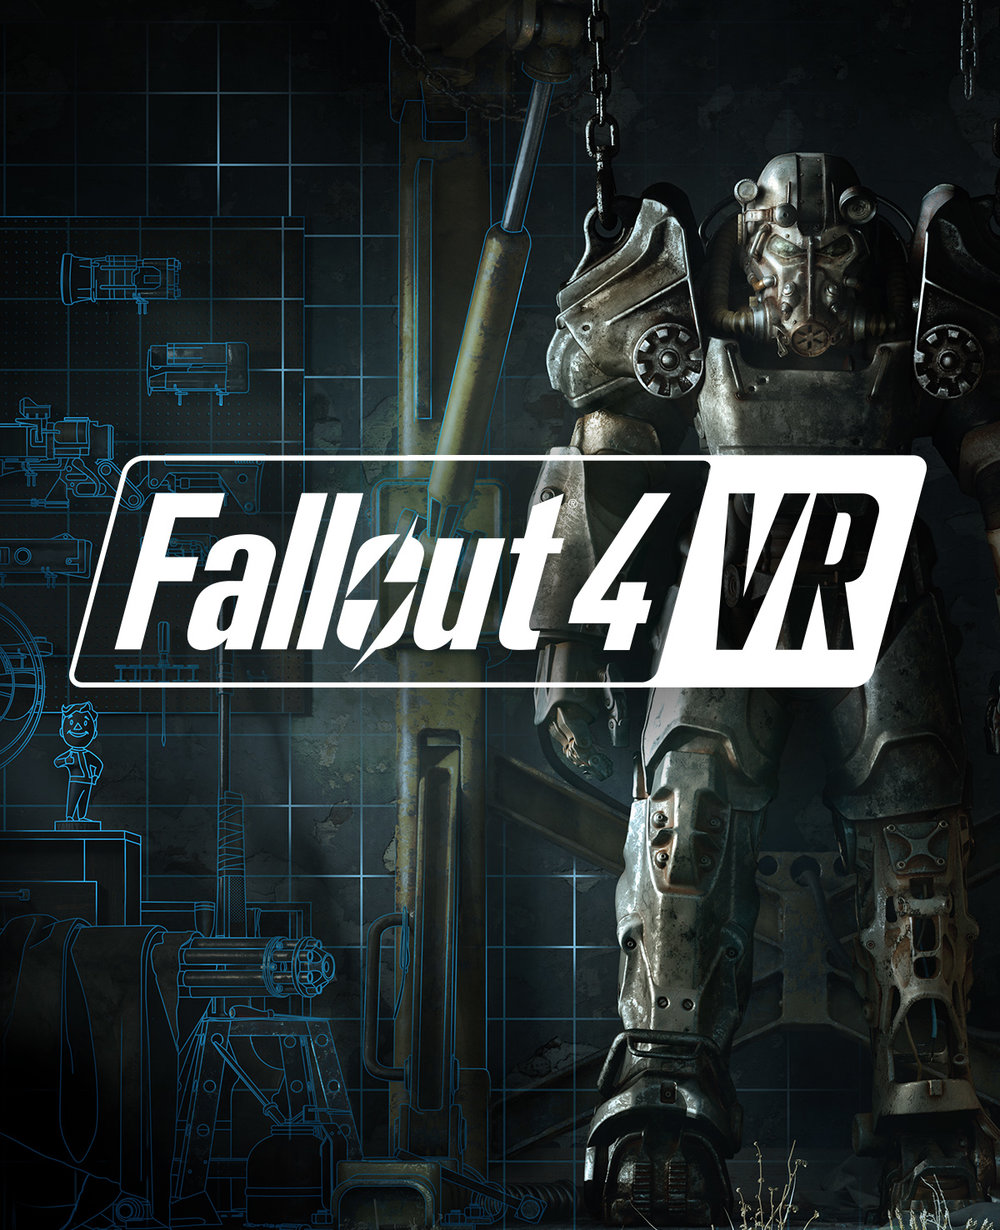 Fallout4VR_boxart-template-1200x1476.jpg